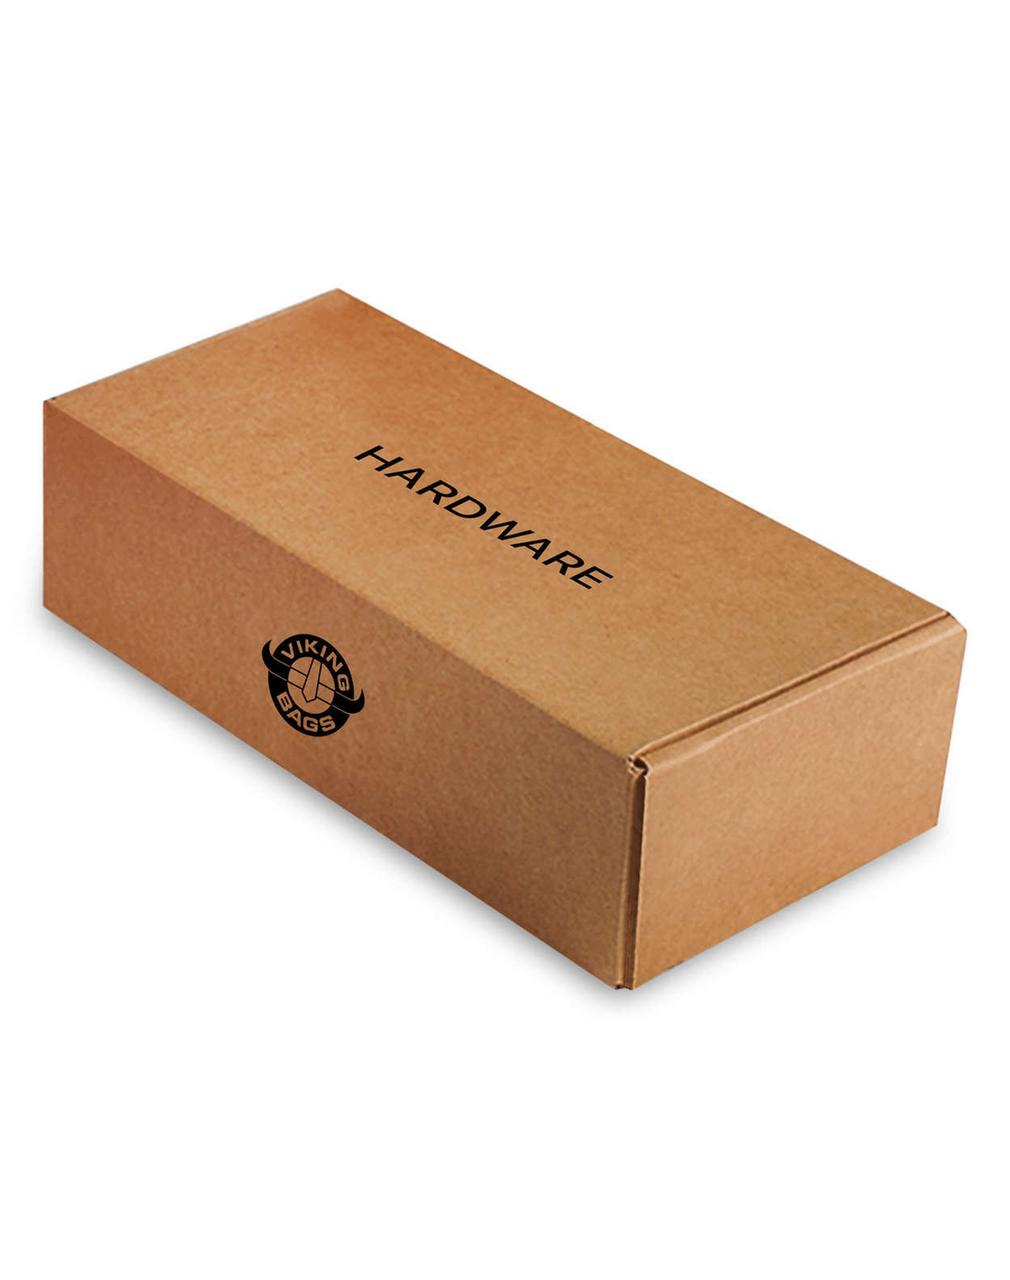 Honda 1100 Shadow Sabre Charger Single Strap Studded Medium Motorcycle Saddlebags Hardware box